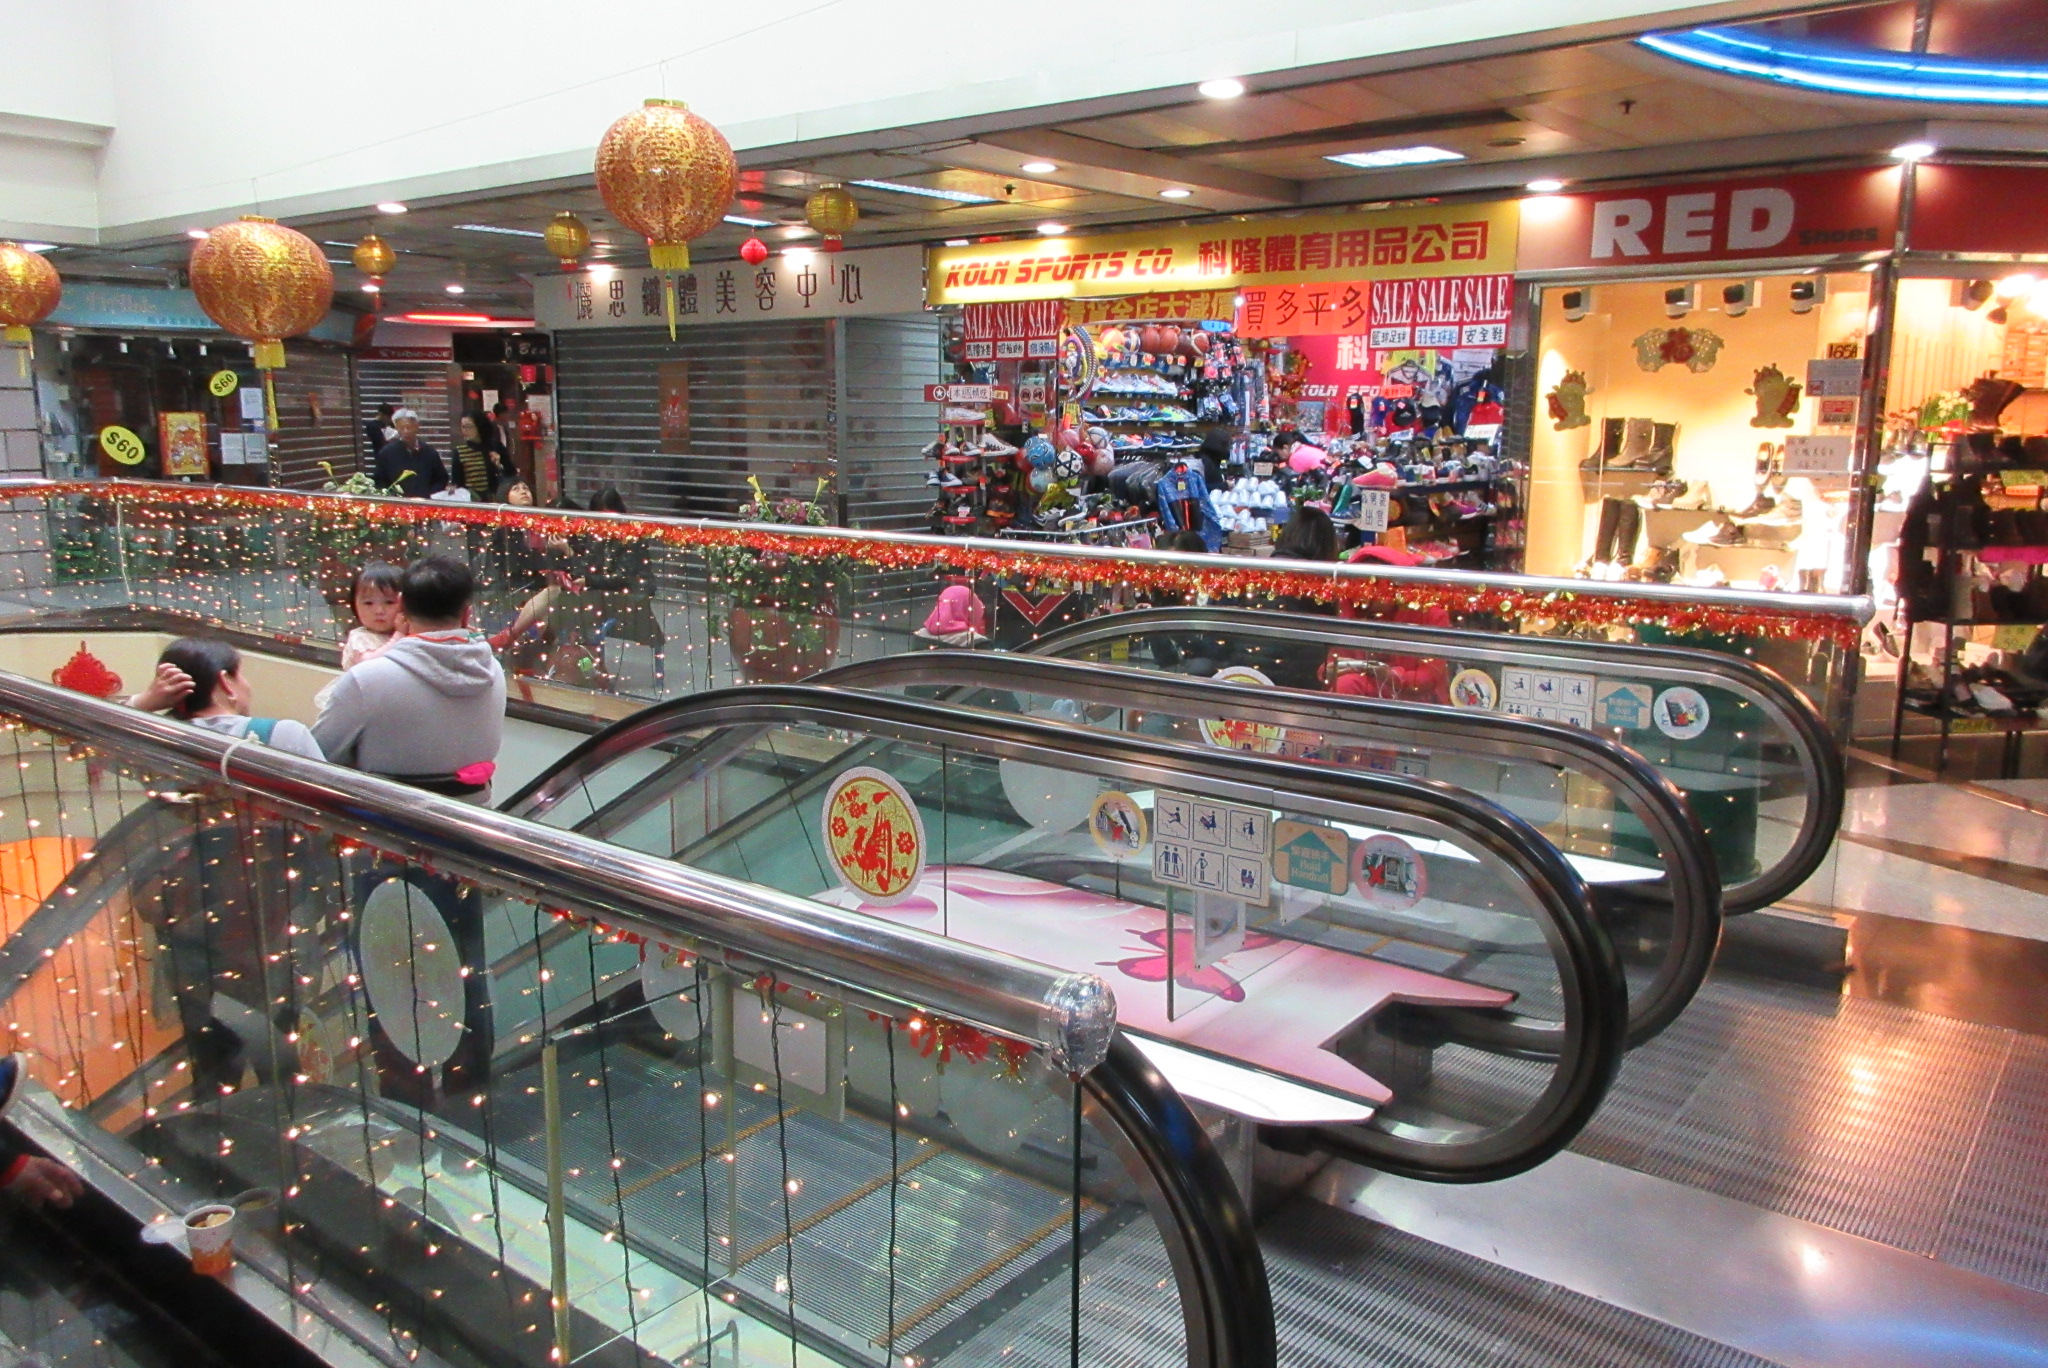 File:HK Lam Tin 藍田 匯景廣場 Sceneway Plaza mall interior escalators Jan 2017 IX3.jpg - Wikimedia Commons